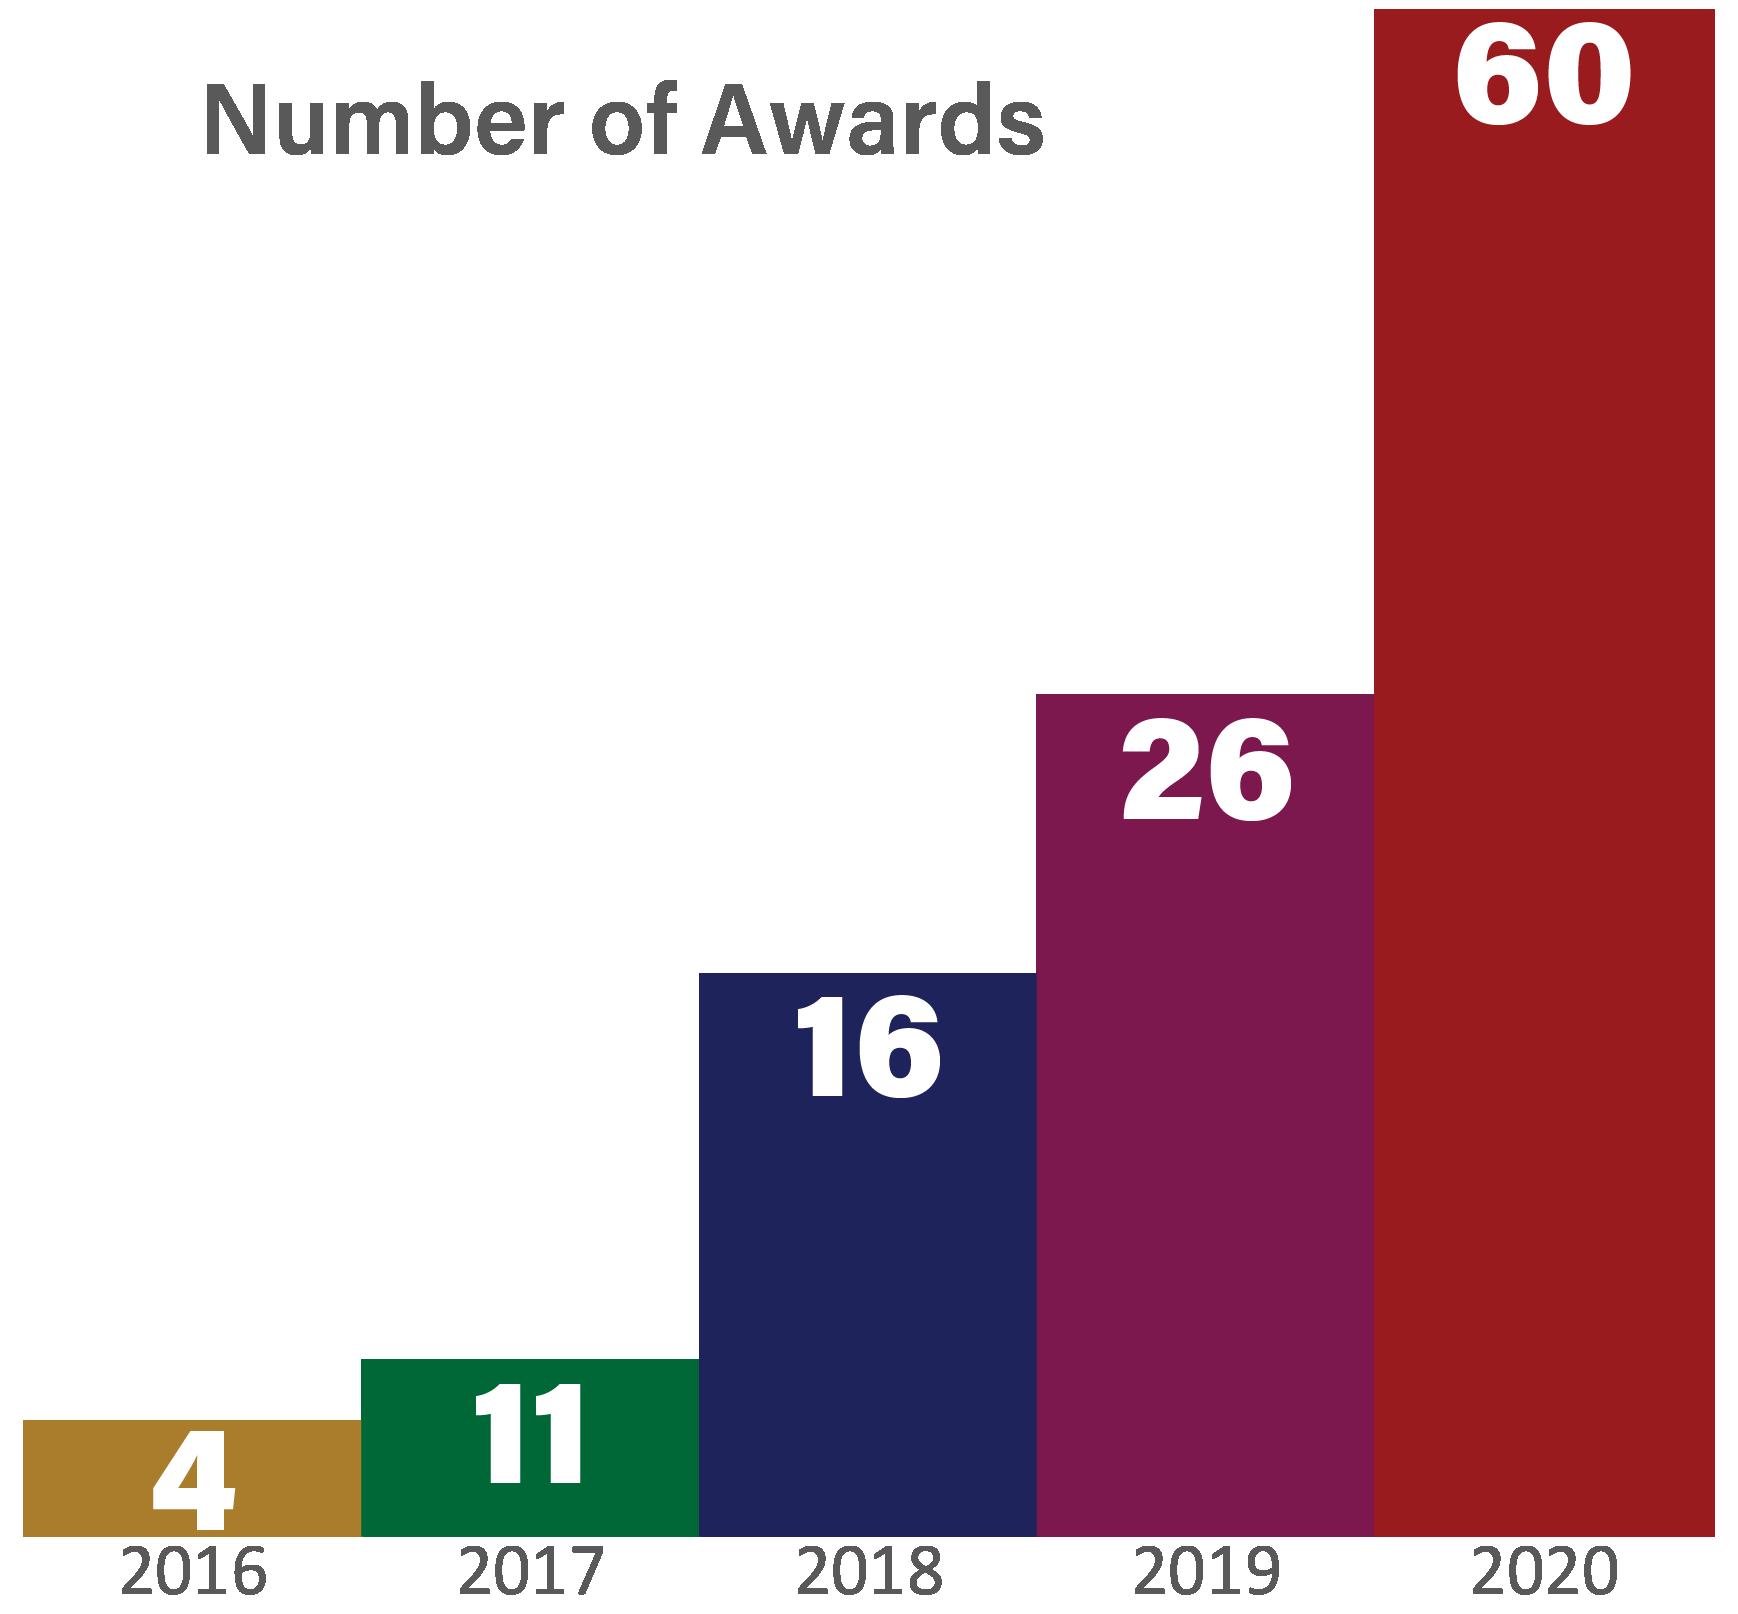 Number of Awards: 2016-4; 2017-11; 2018-16; 2019-26; 2020-60